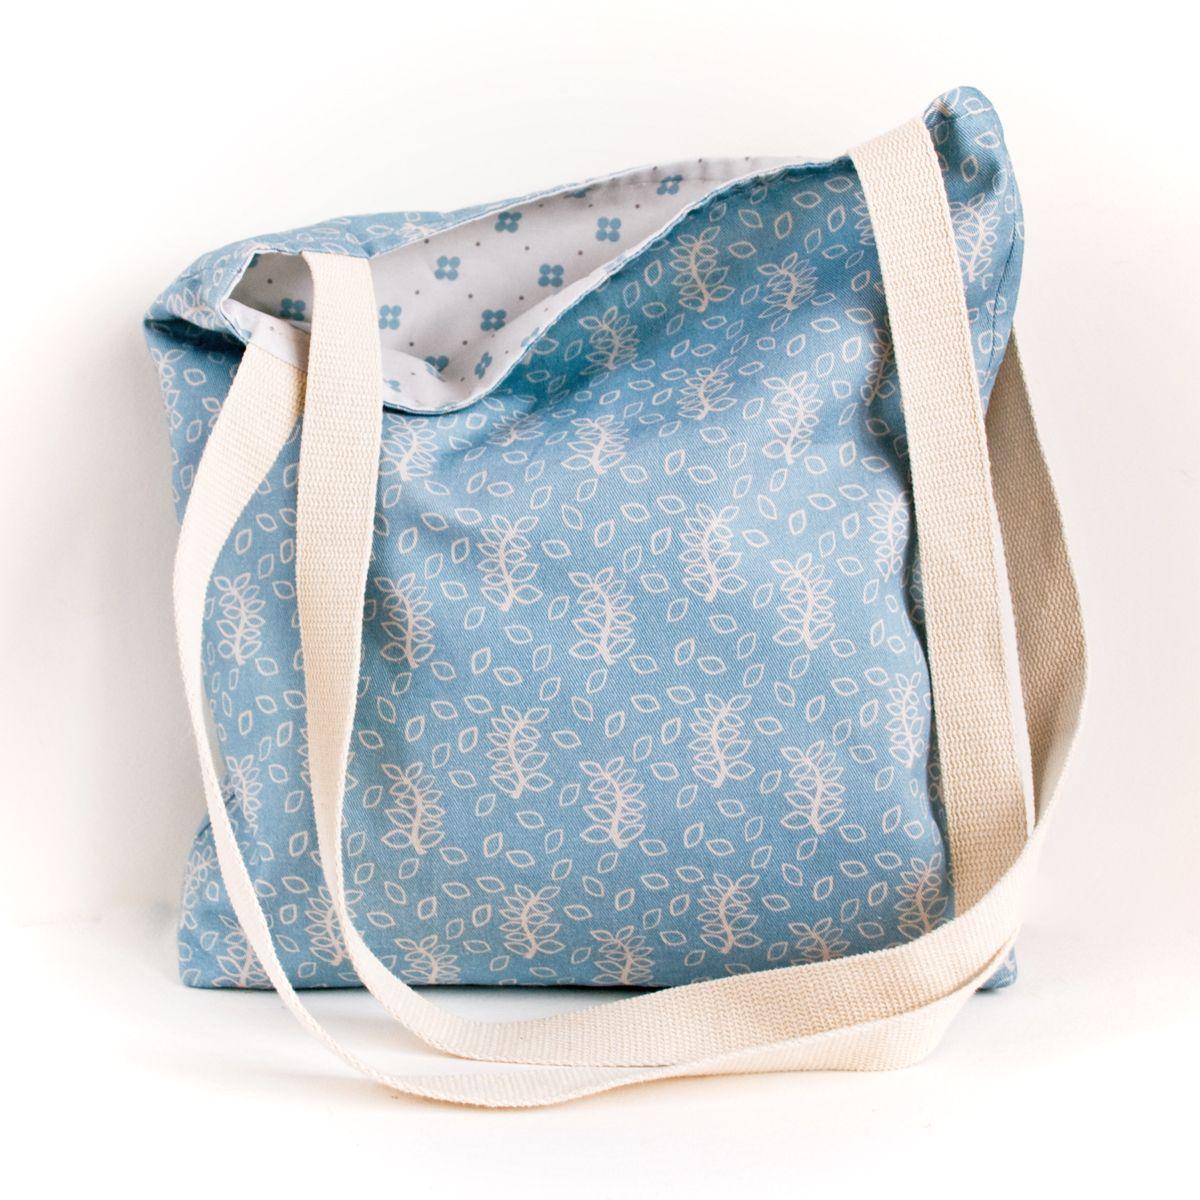 Duck egg blue tote bag